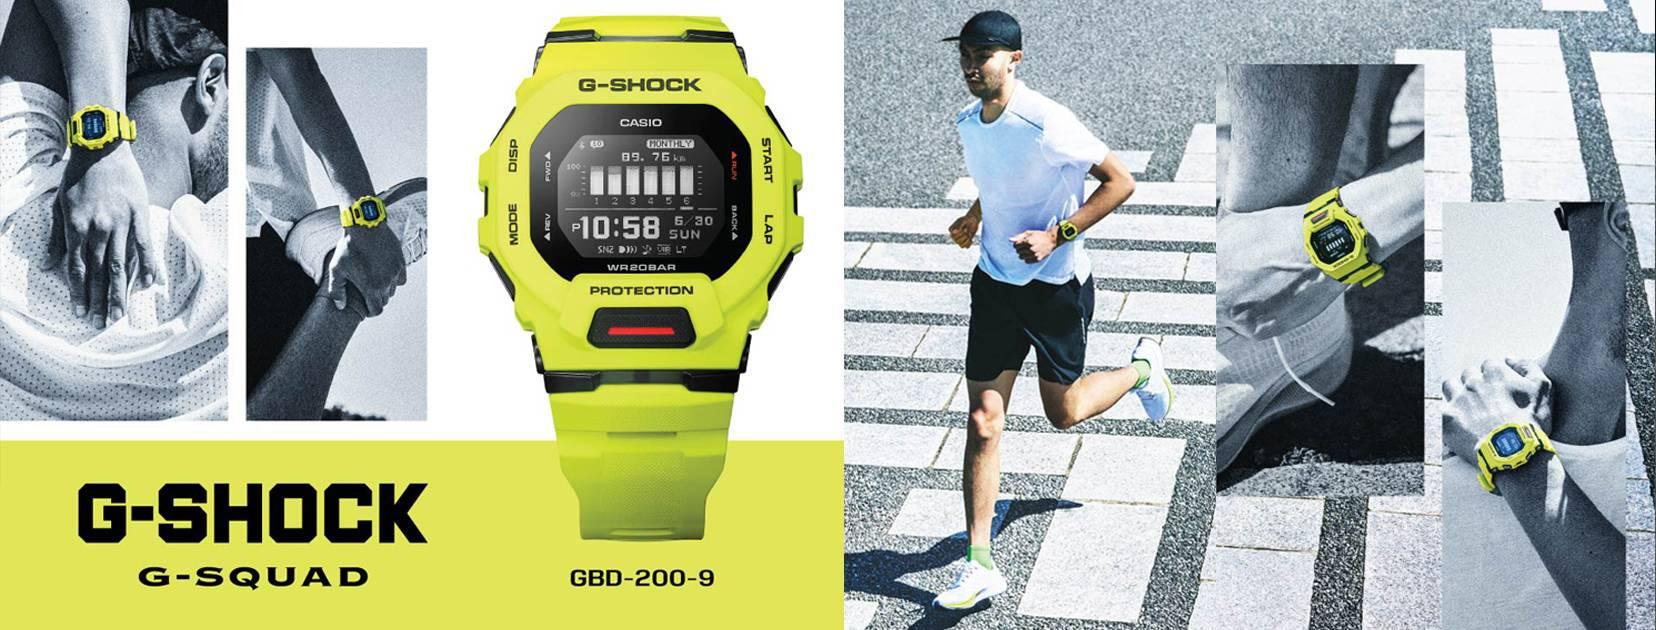 GBD-200